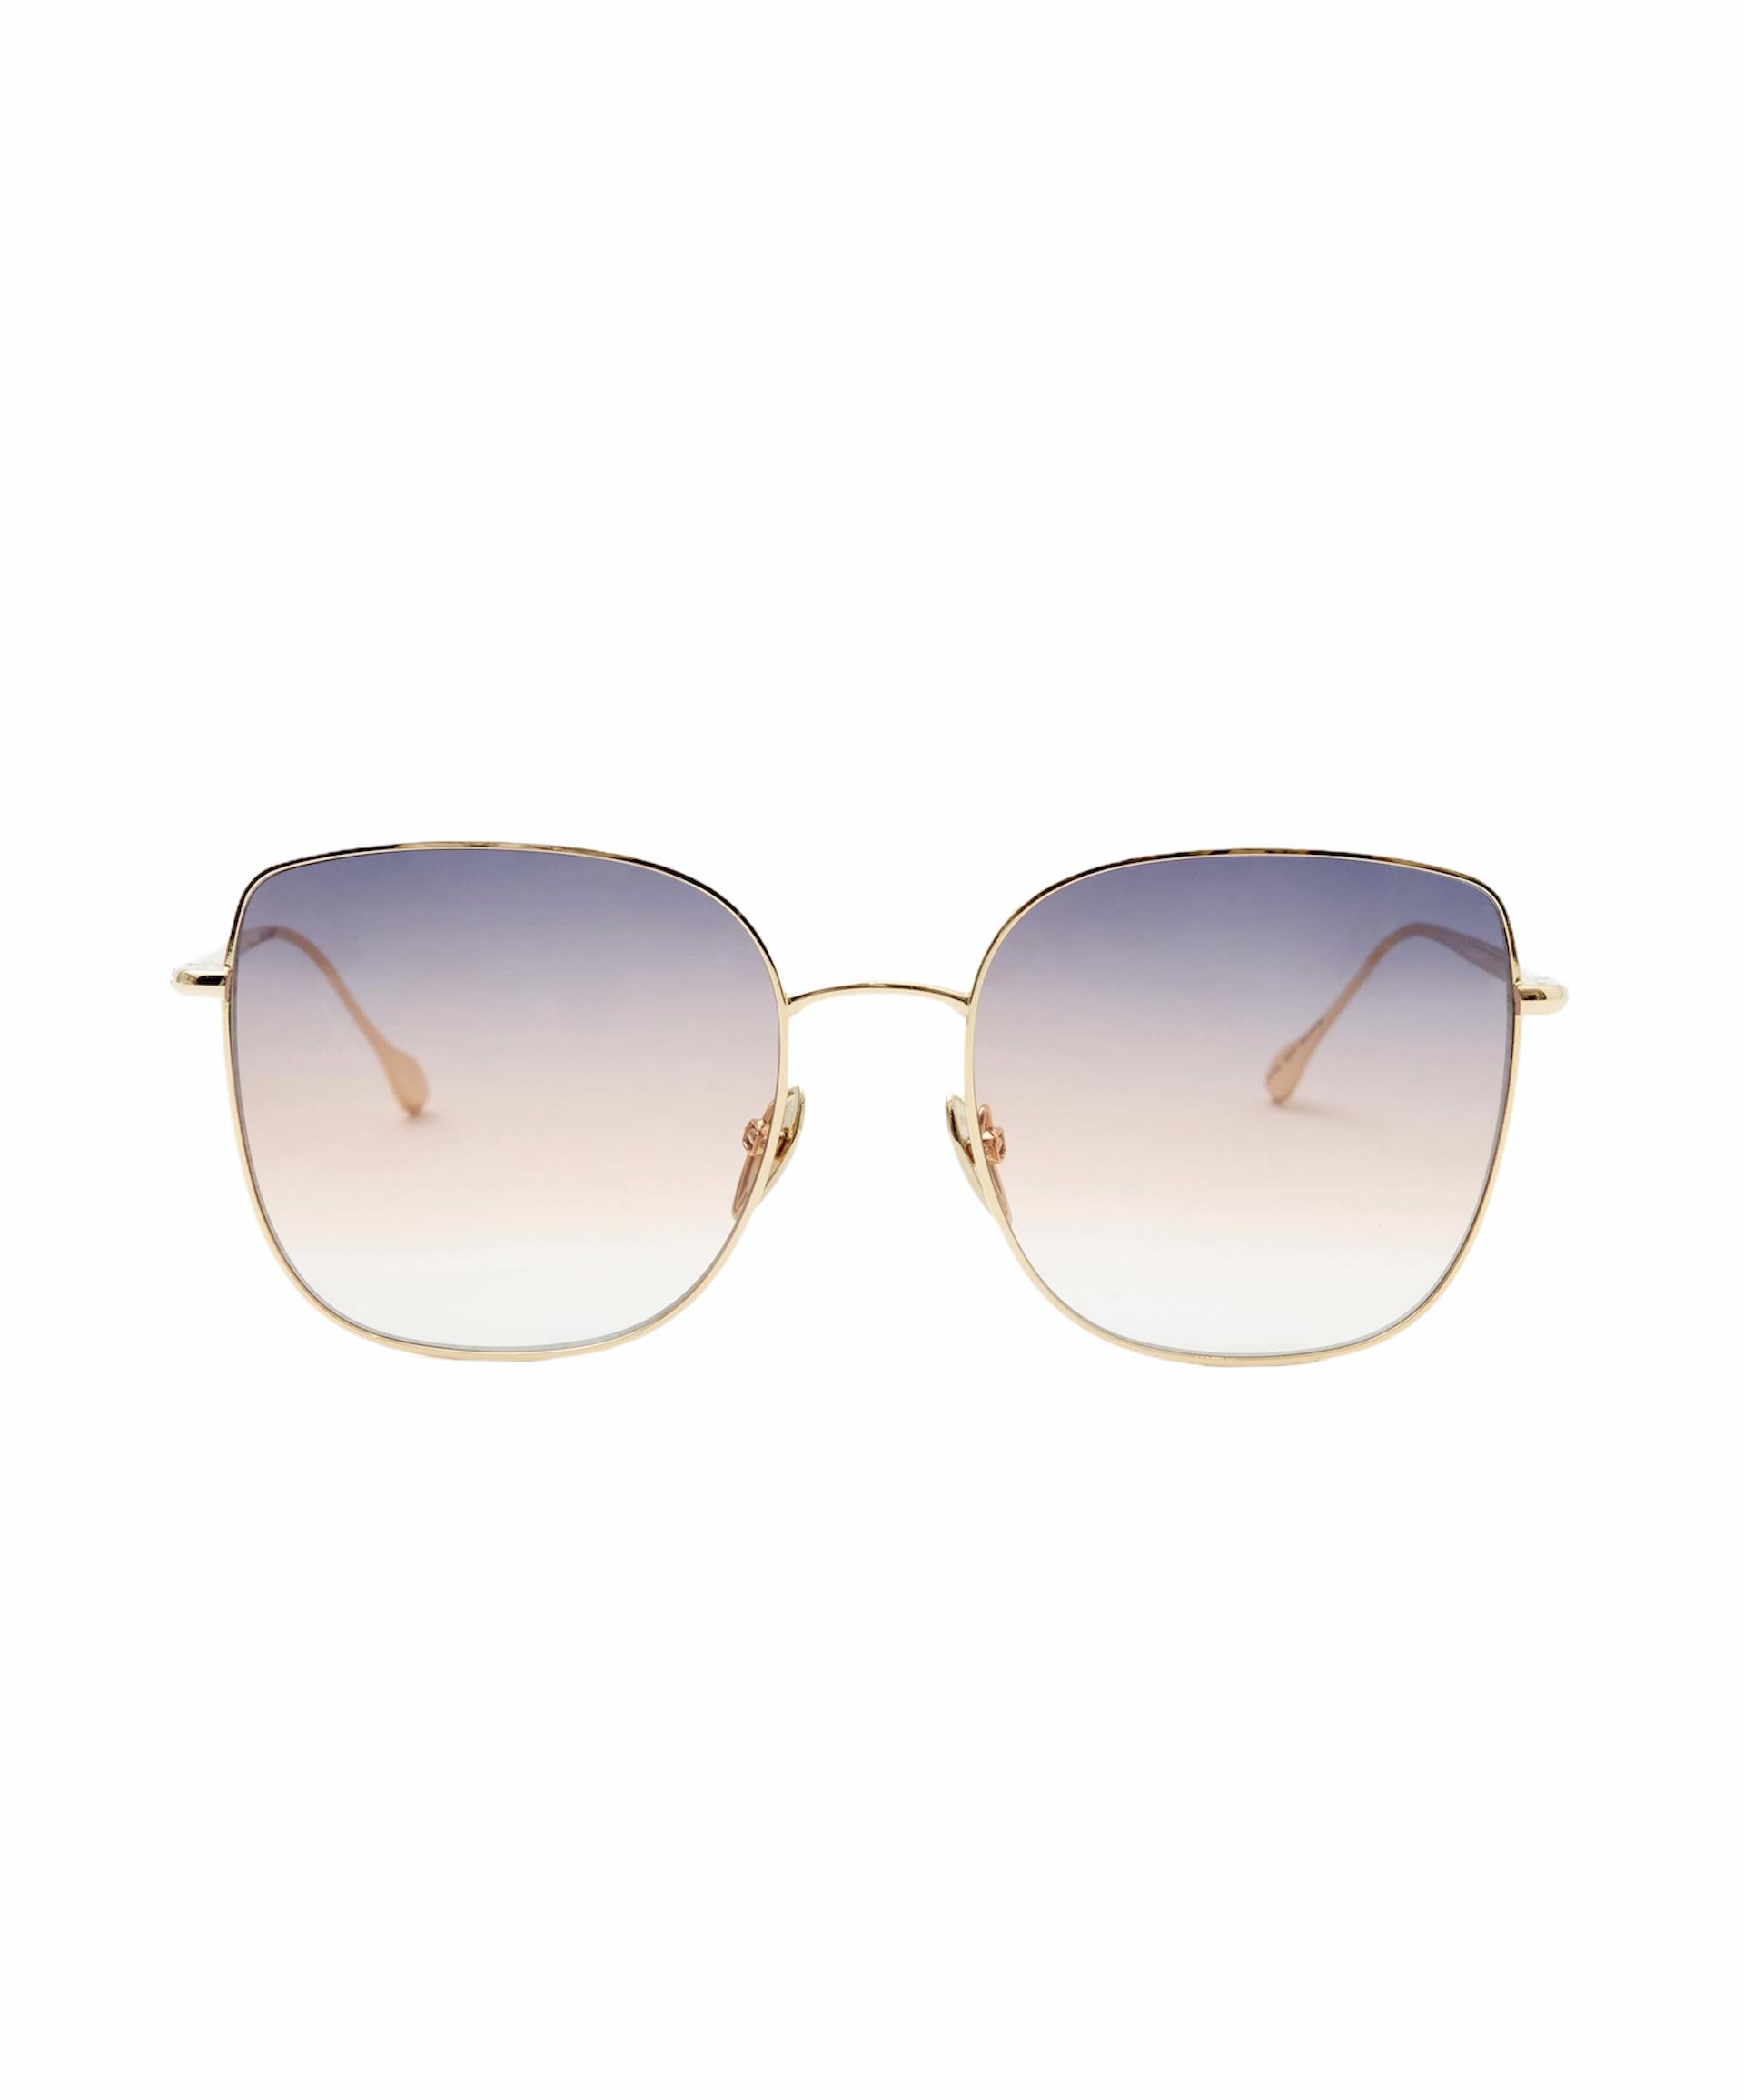 Isabel Marant, Sonnenbrille, Zuko, Sunglasses